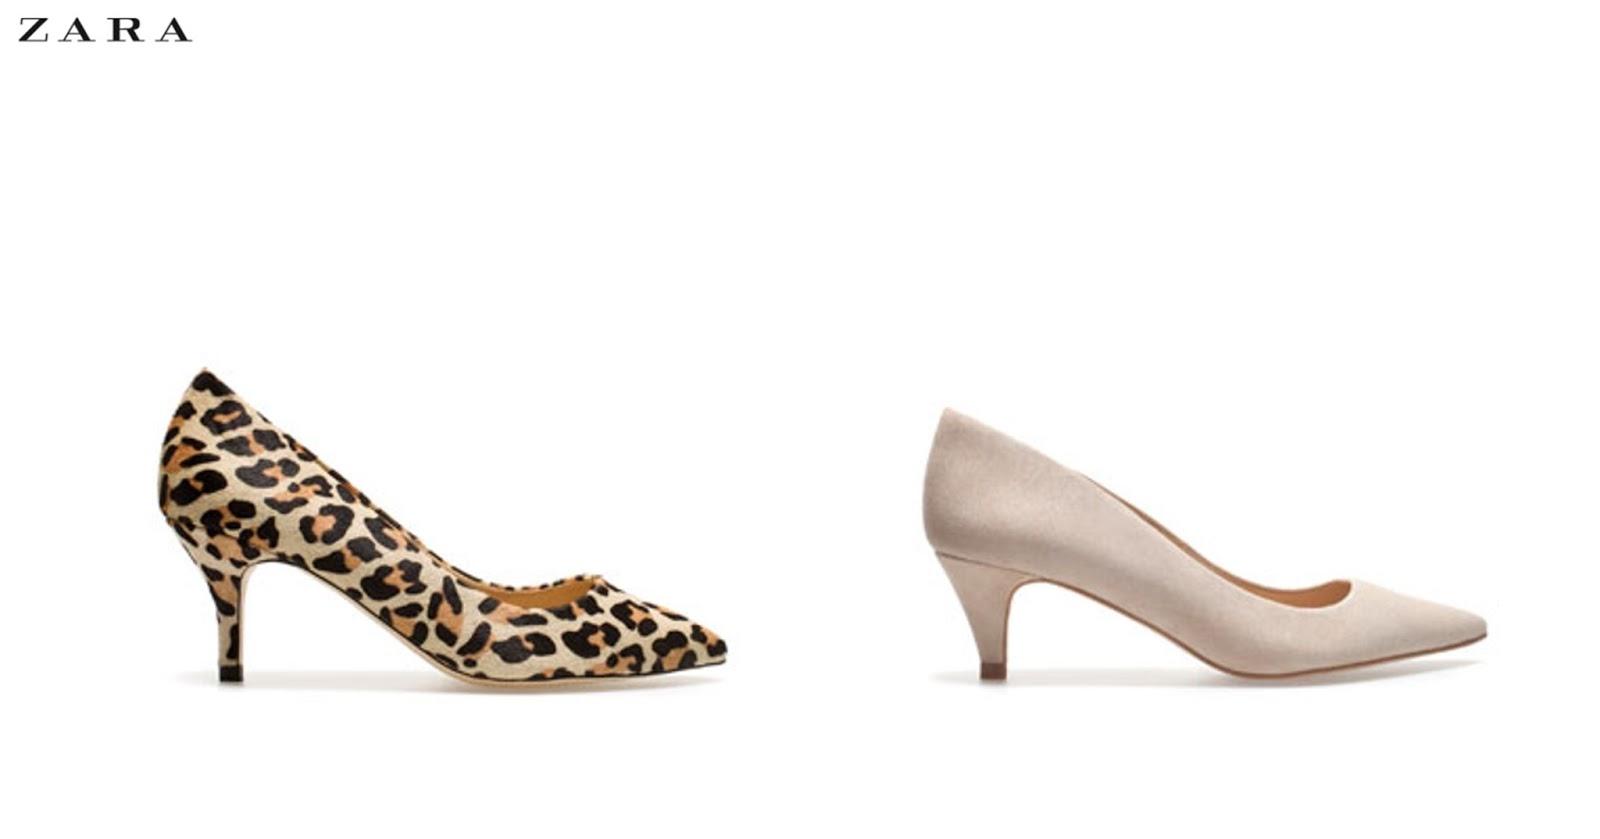 Zara Kitten Heel Pointed Shoes